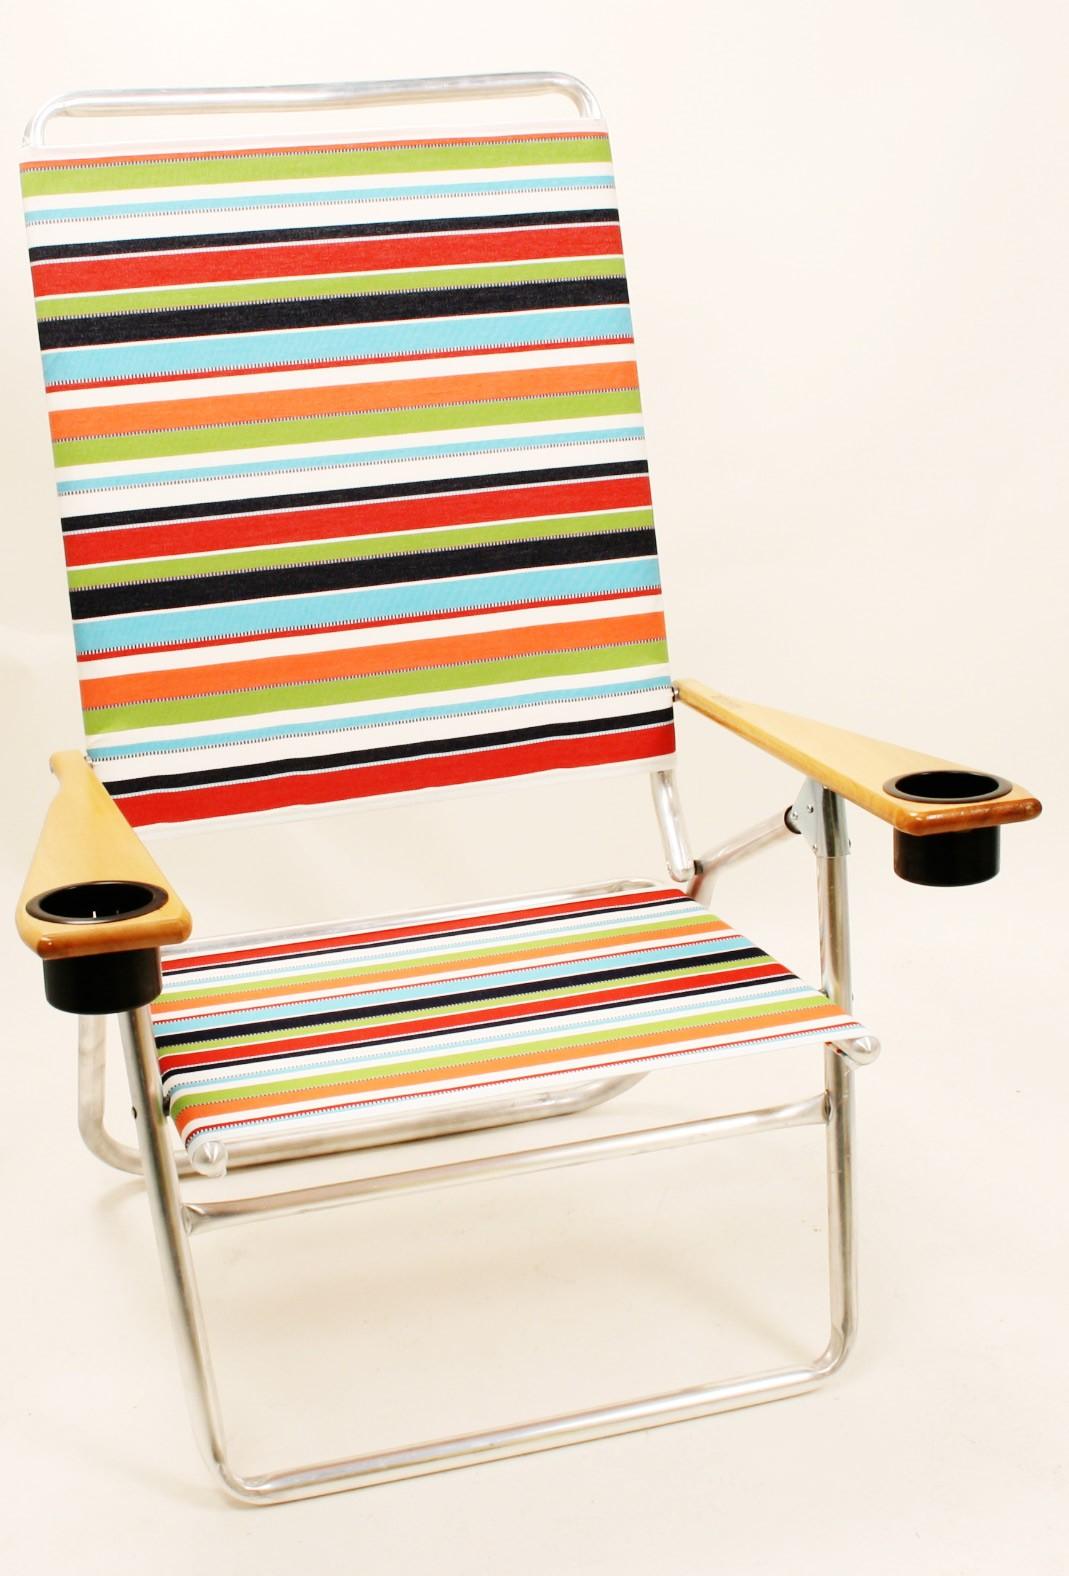 Telescope 511 High Boy w Cup holders Aluminum Frame Beach Chairs